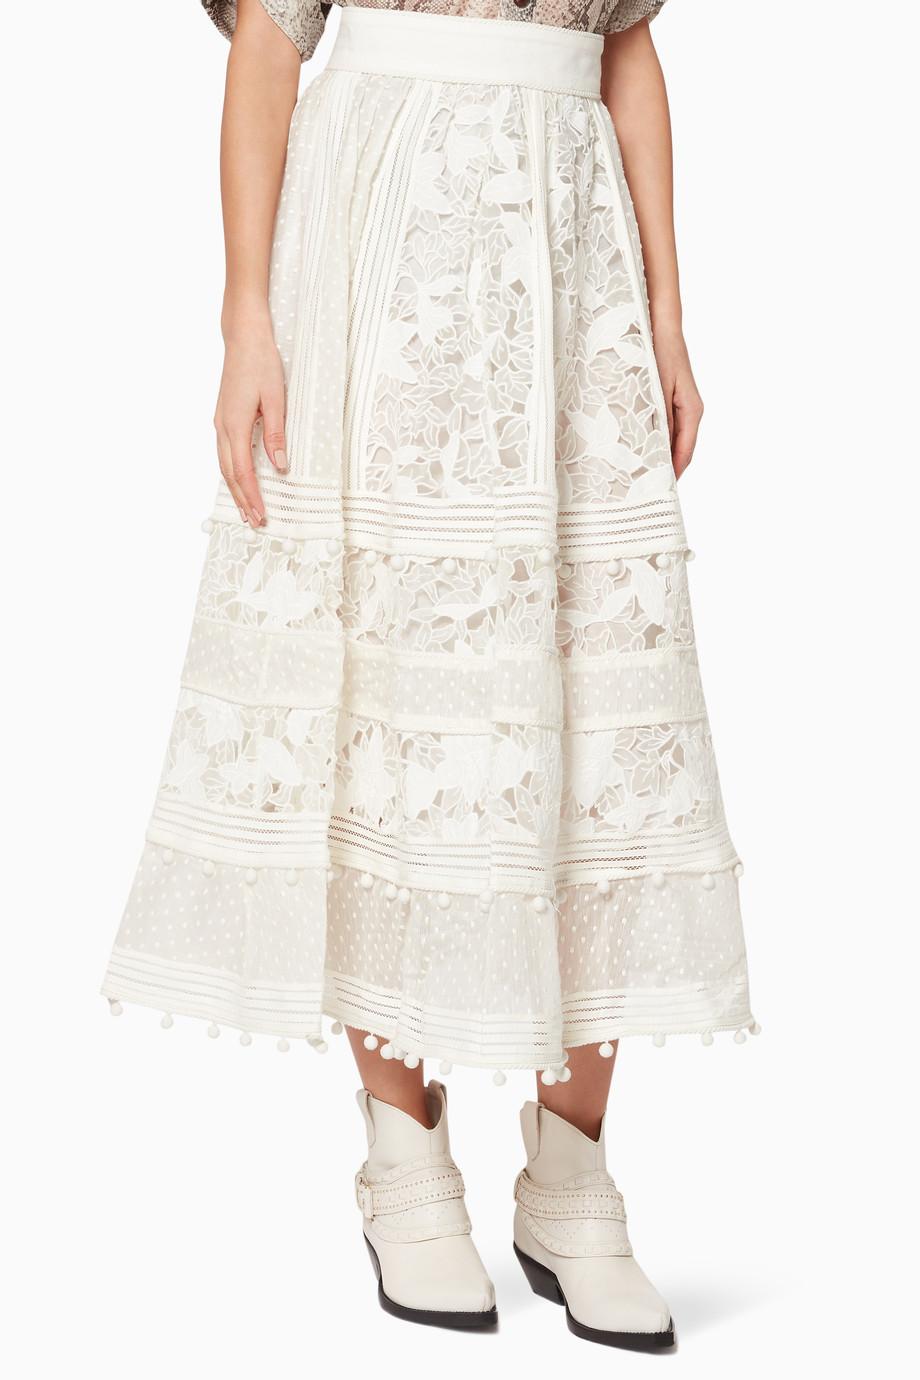 e2d87ce1fb66 Shop Zimmermann Neutral Ivory Corsage Embellished Skirt for Women ...